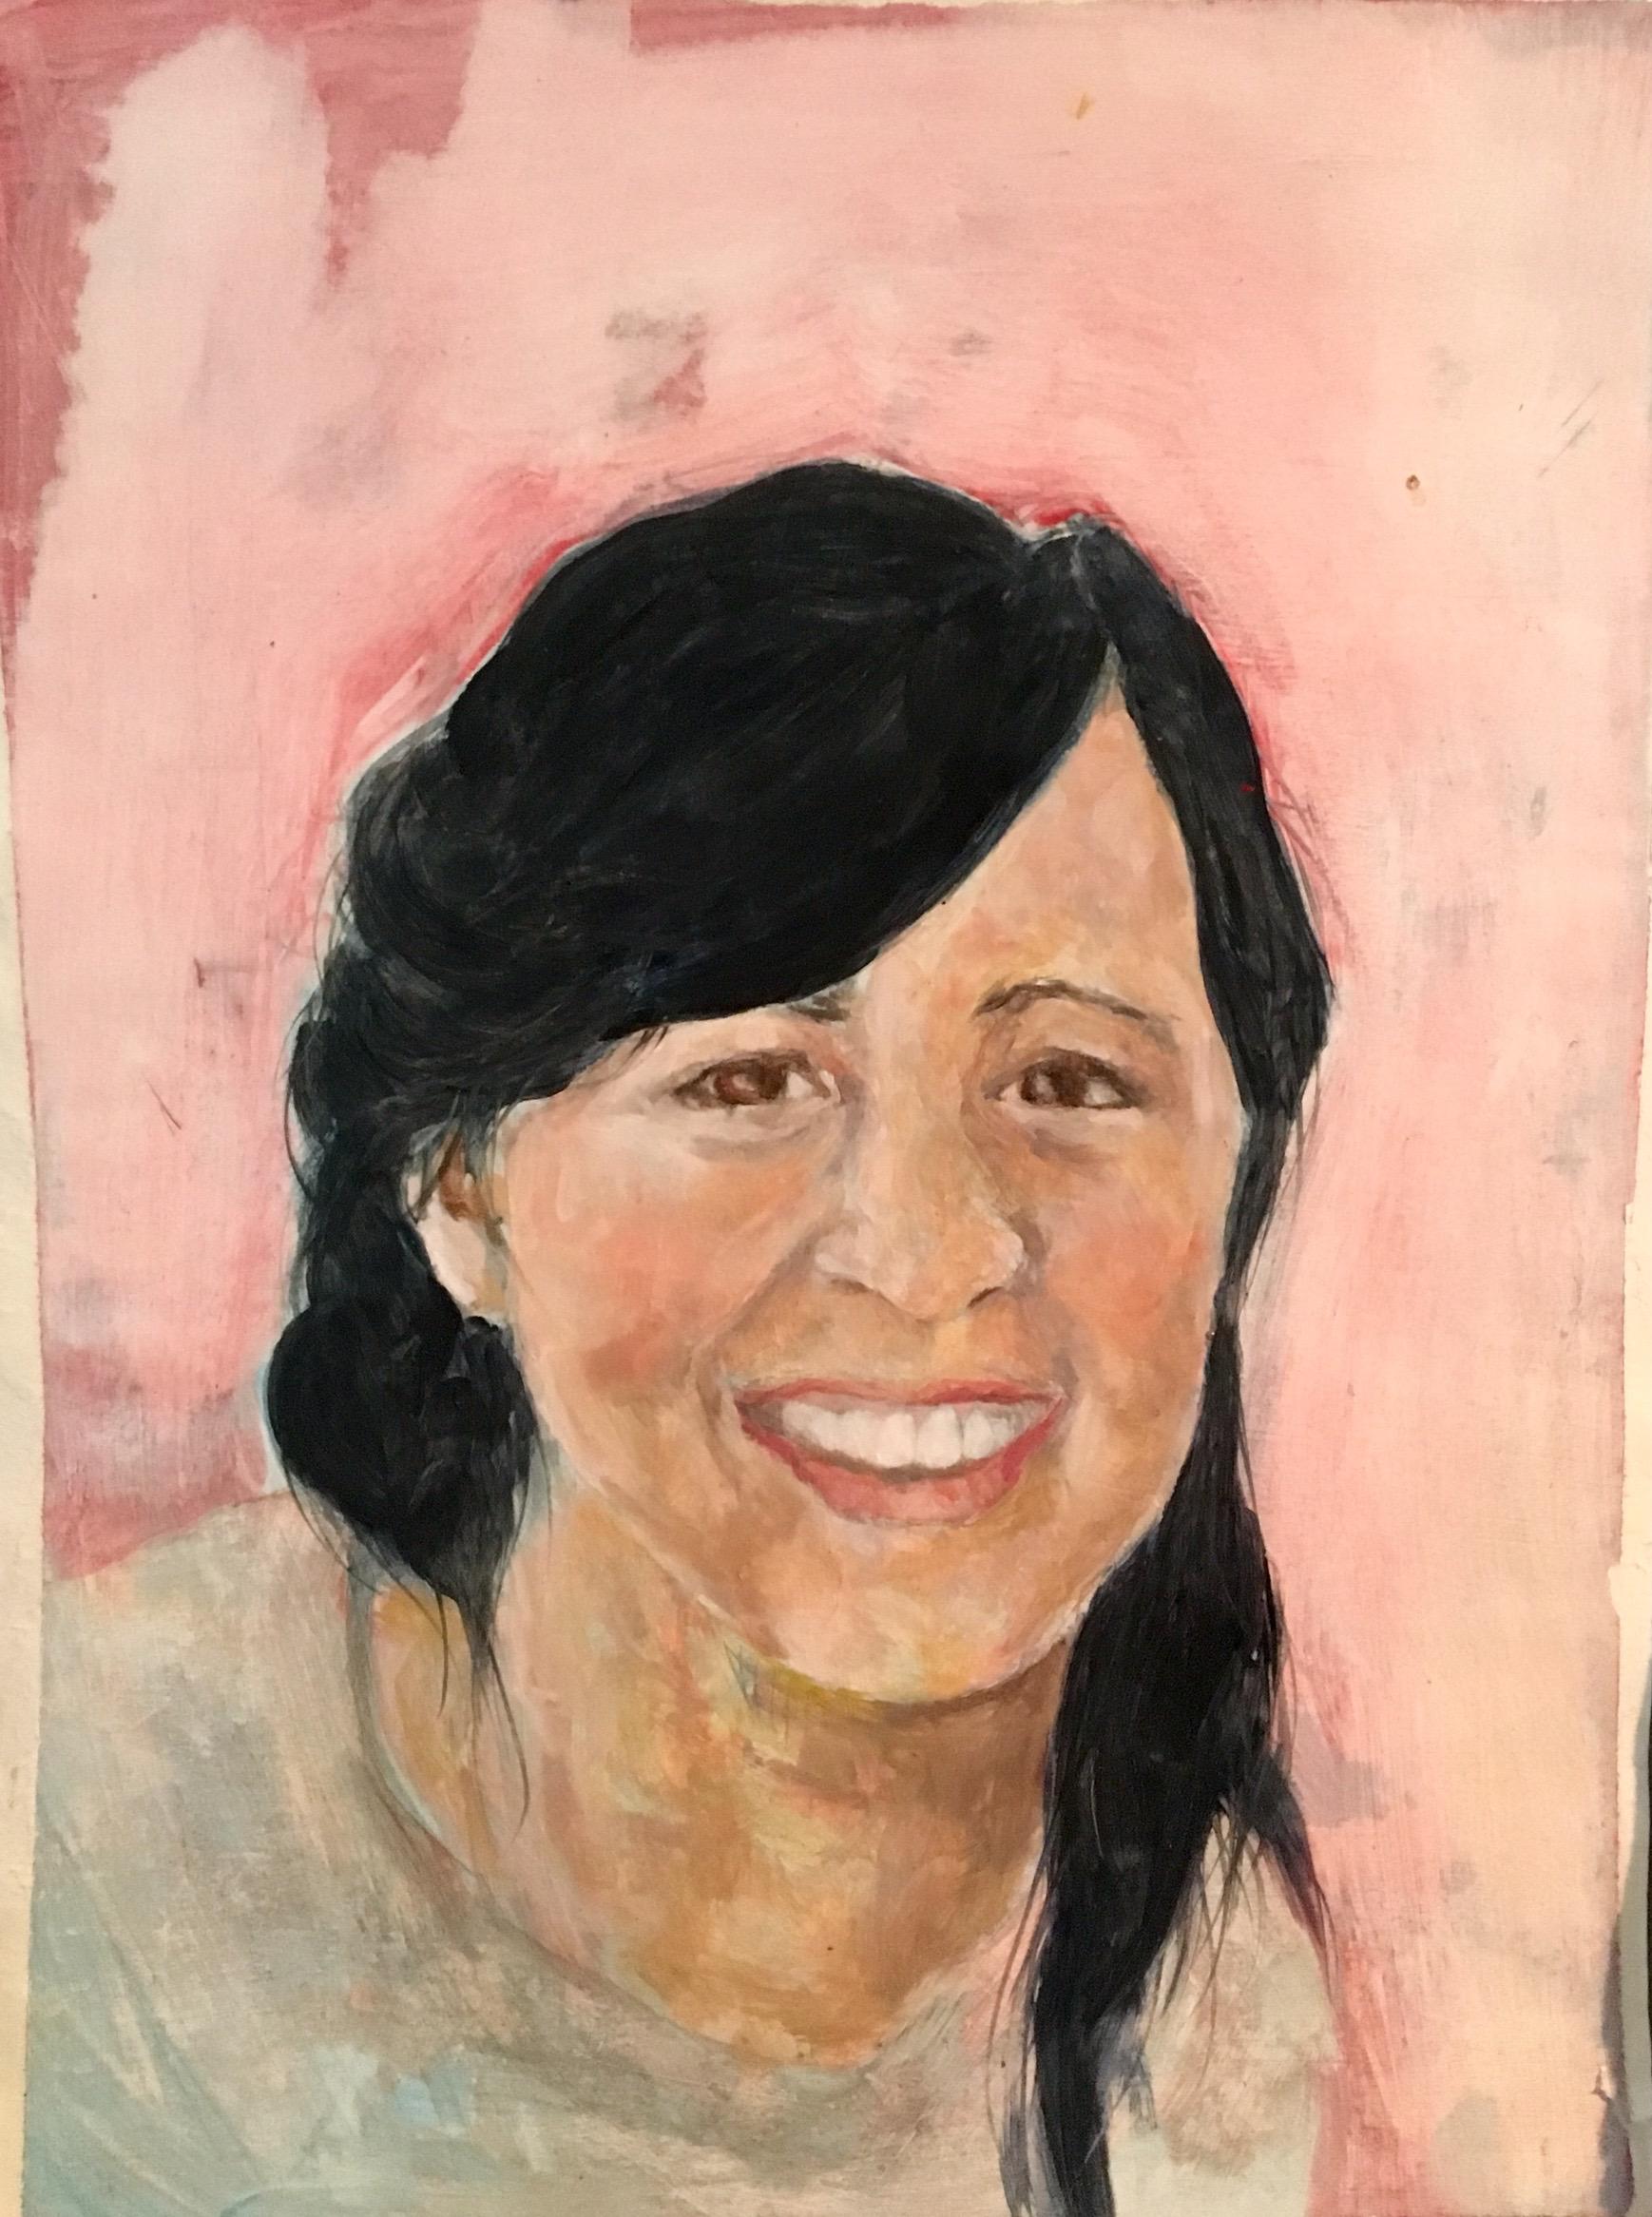 Emma Jay,Oil on Paper, 2016